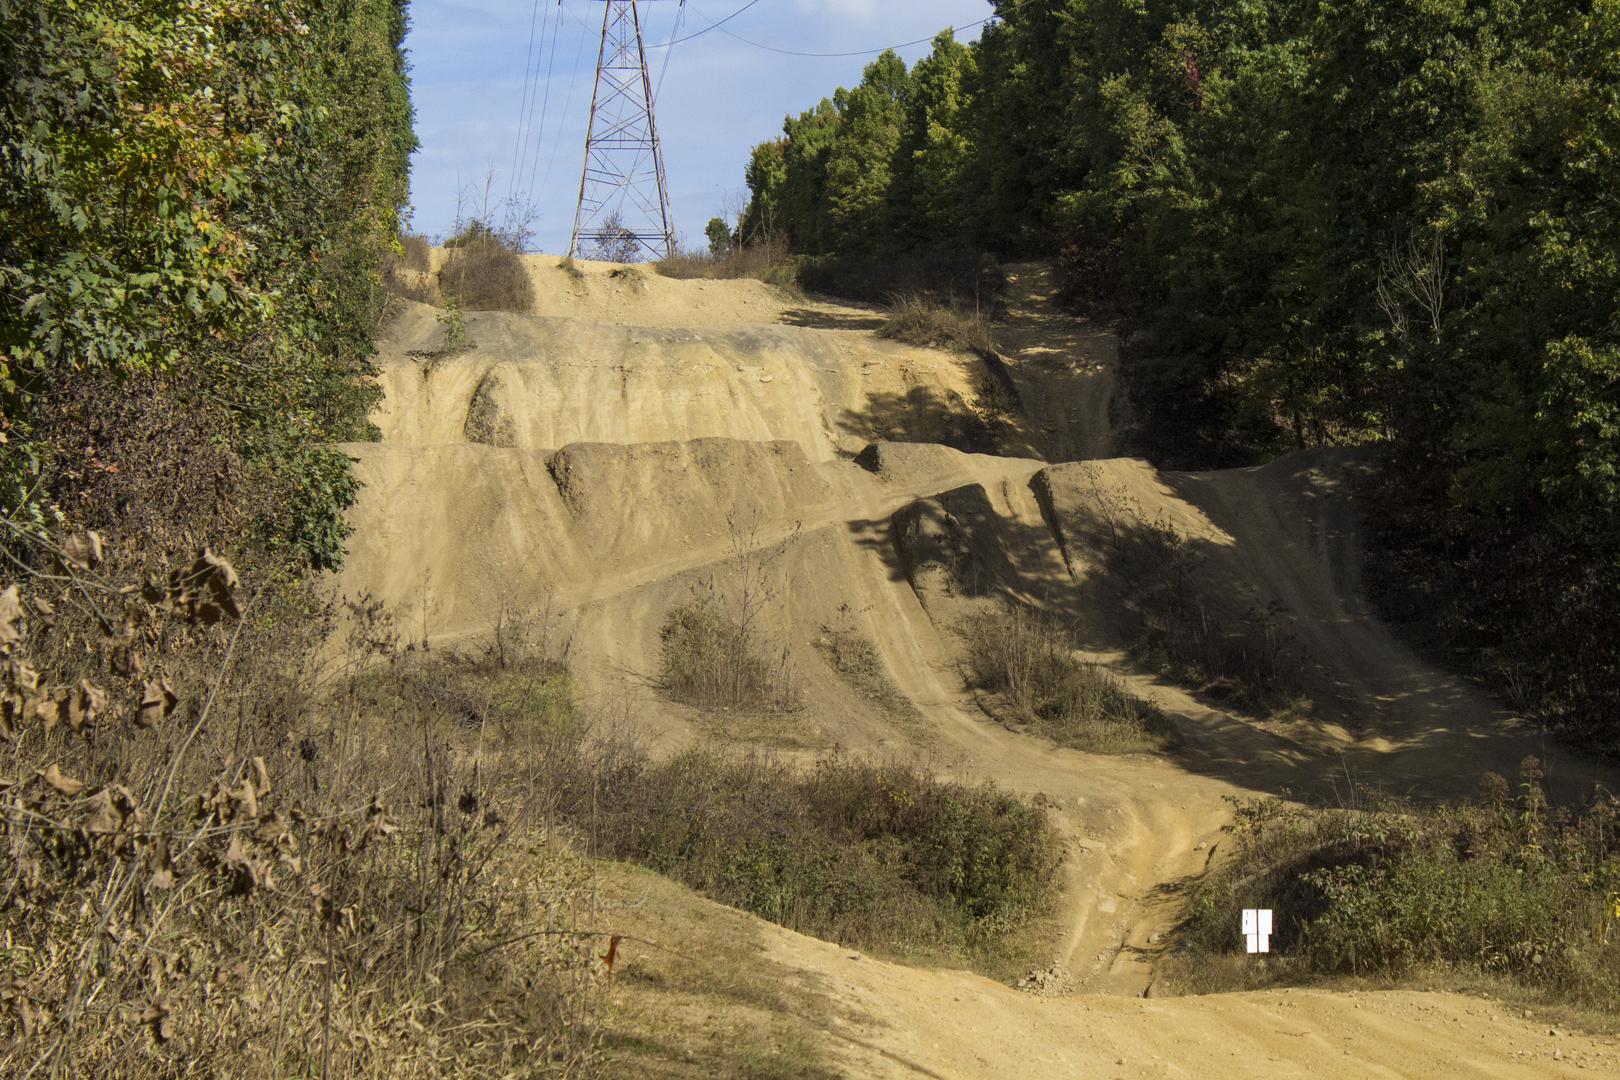 Mines and Meadows ATV/RV Resort - Trails, ATV Riding Dirt